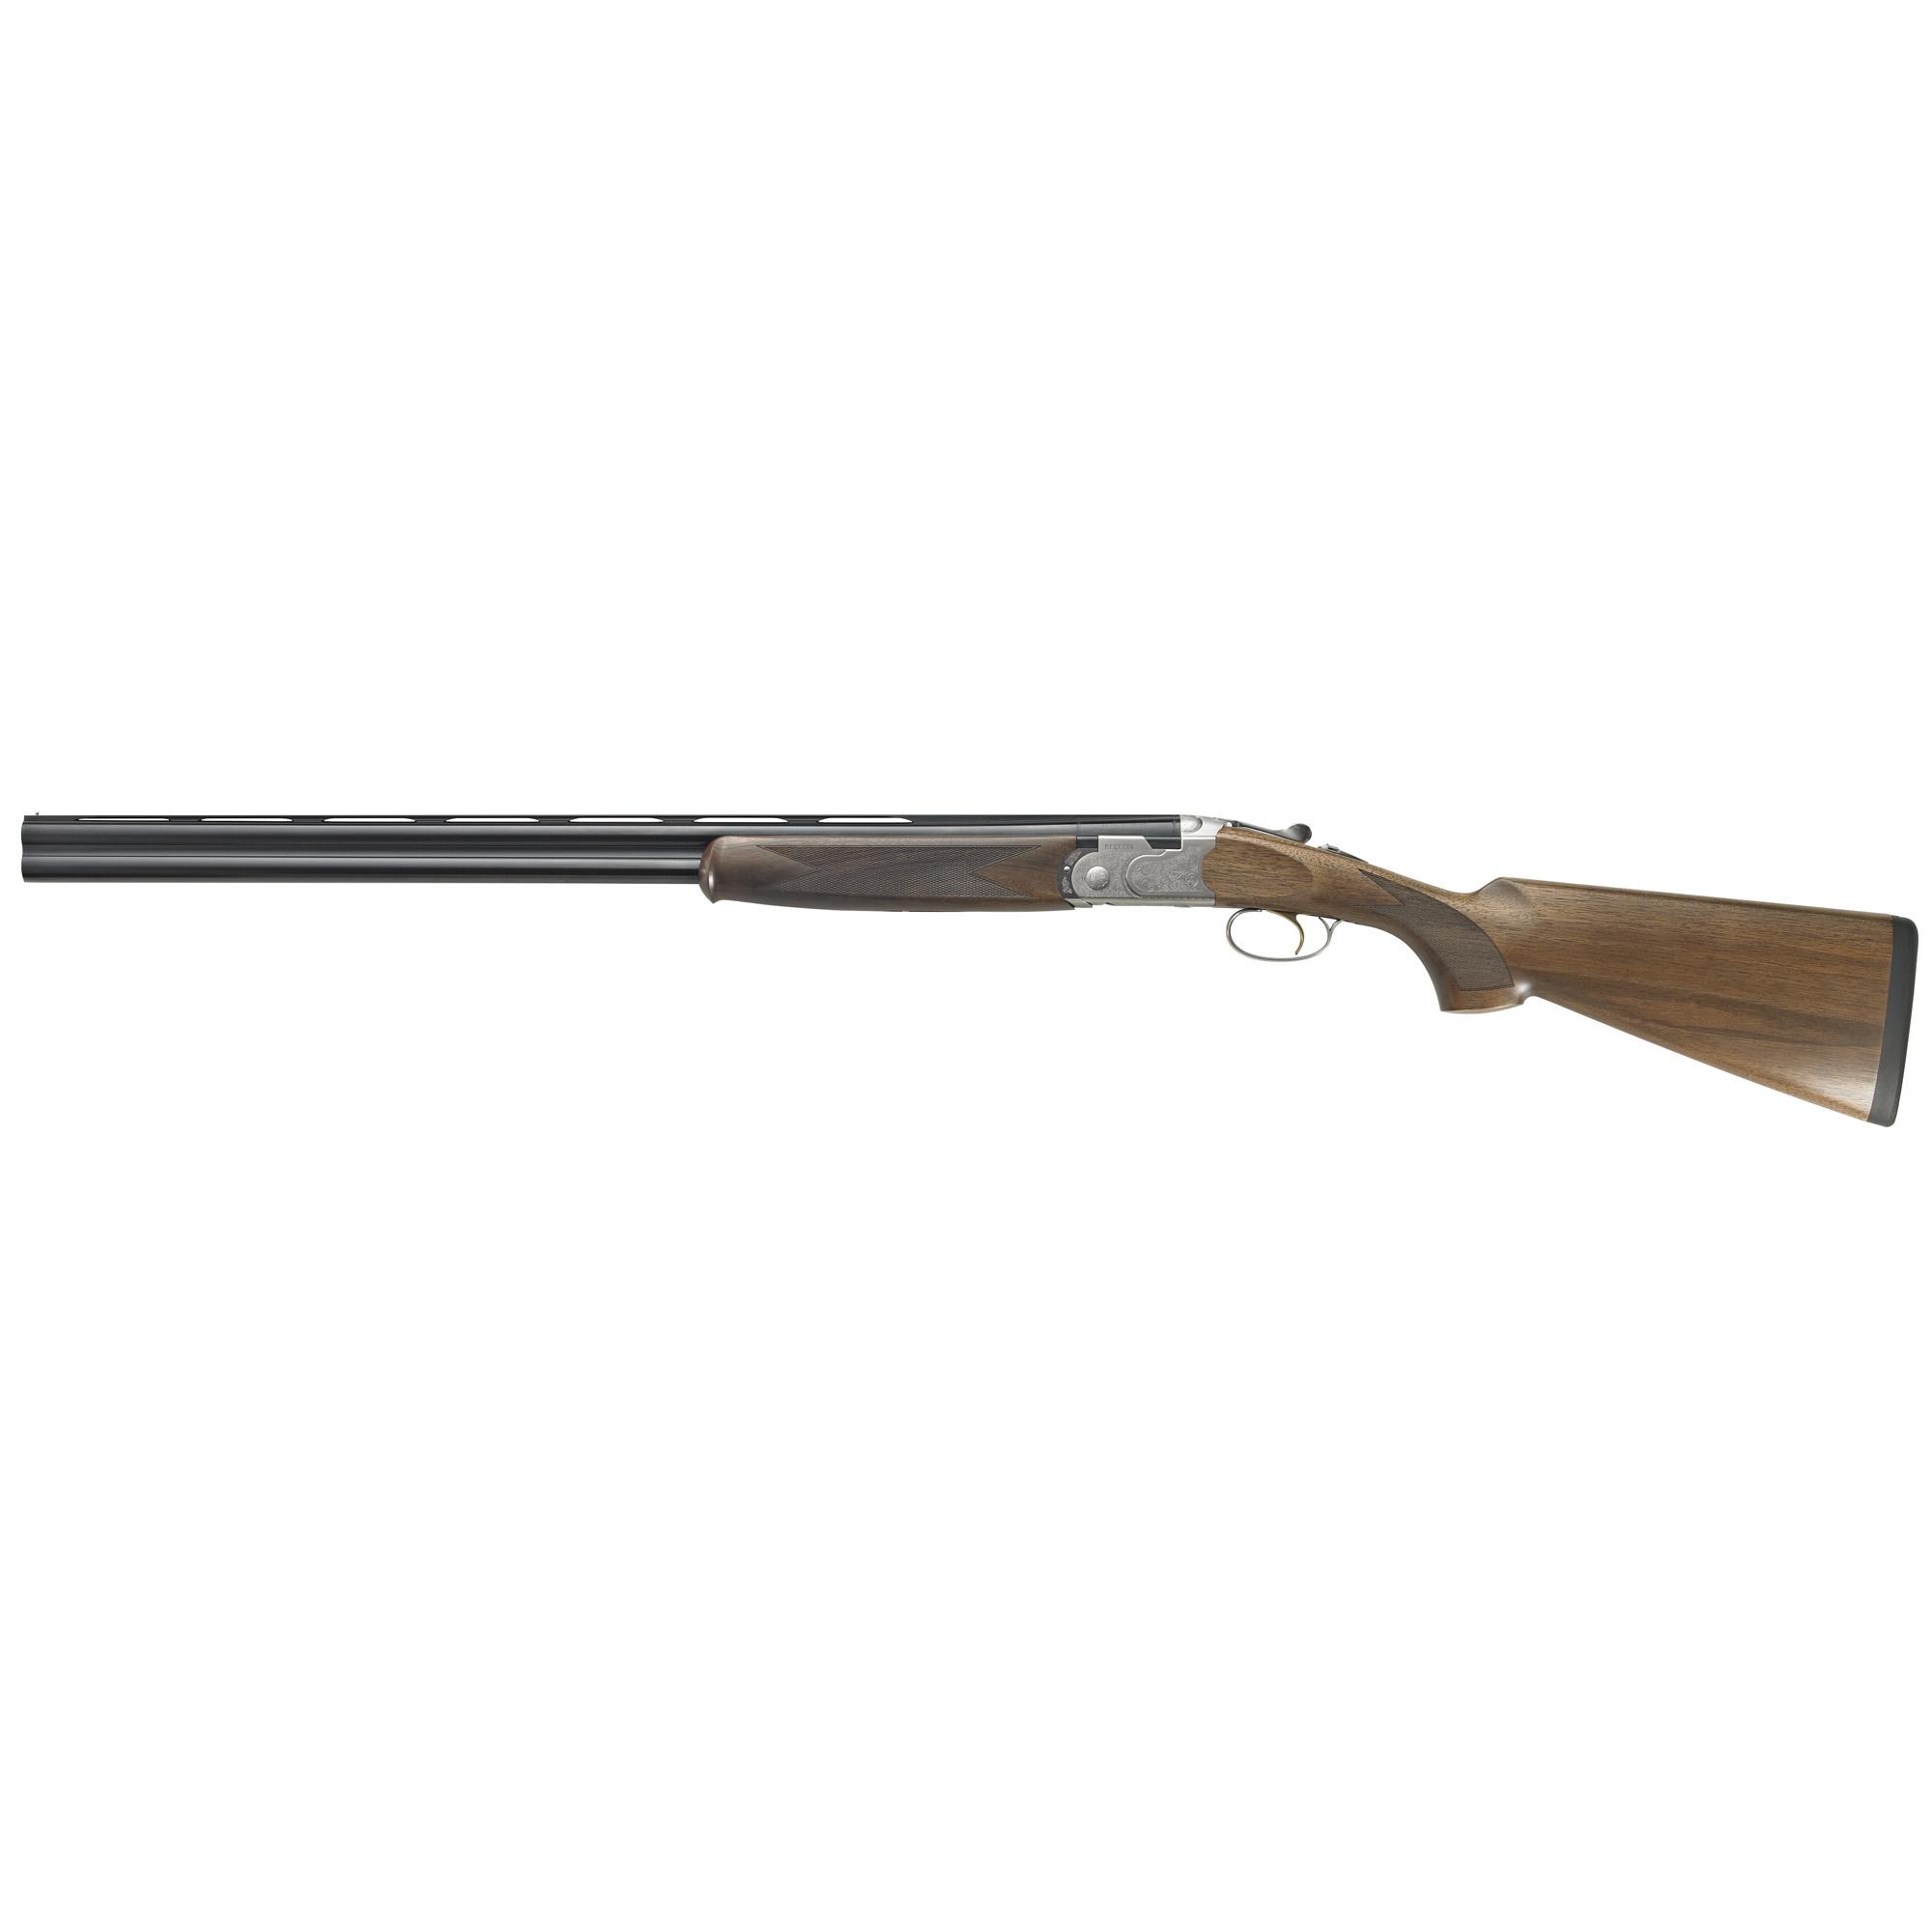 Beretta 686 Silver Pigeon Spt 20/30